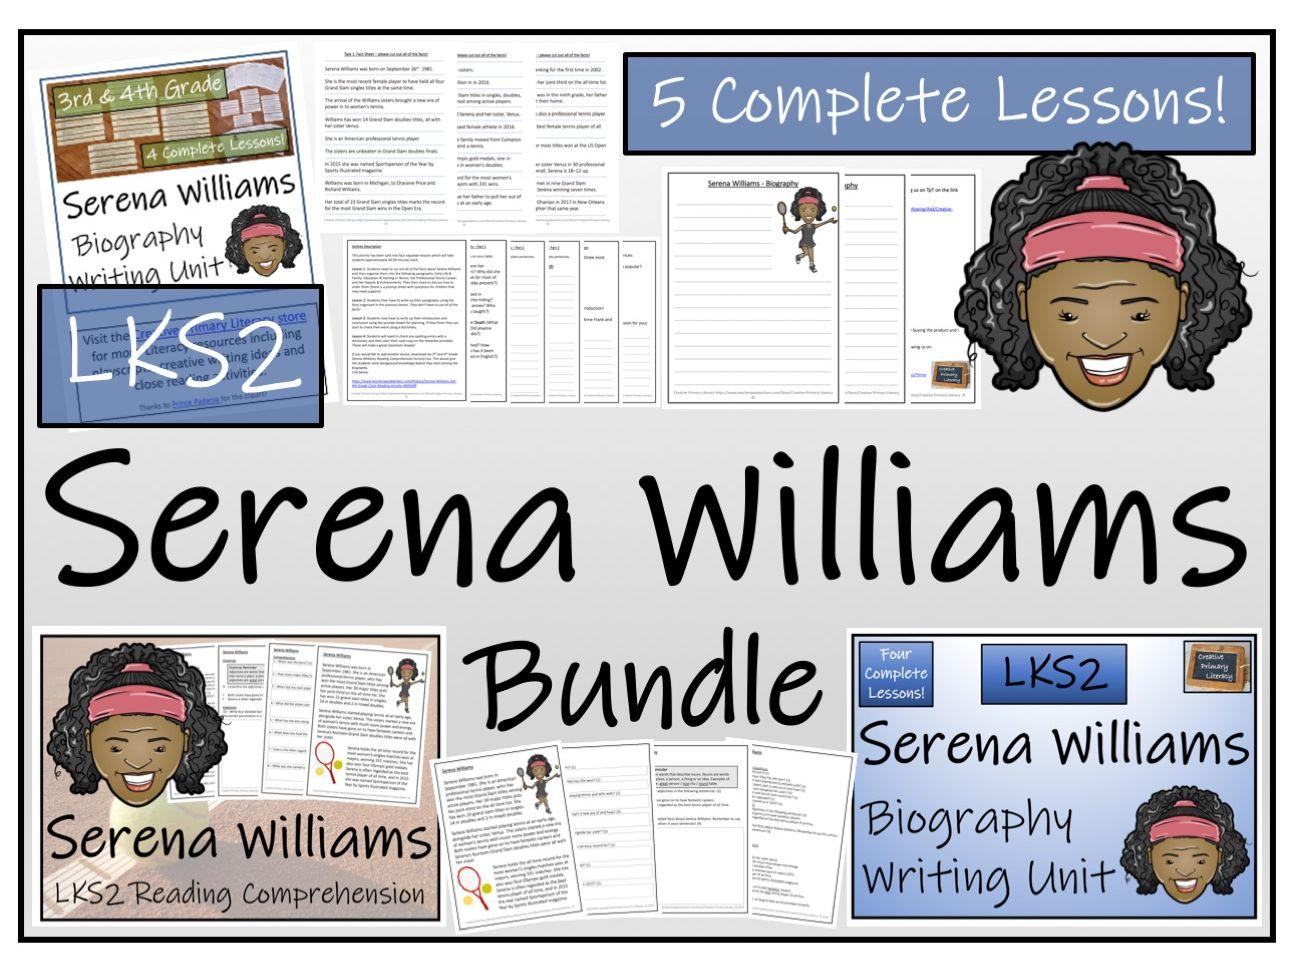 LKS2 Literacy - Serena Williams Reading Comprehension & Biography Bundle